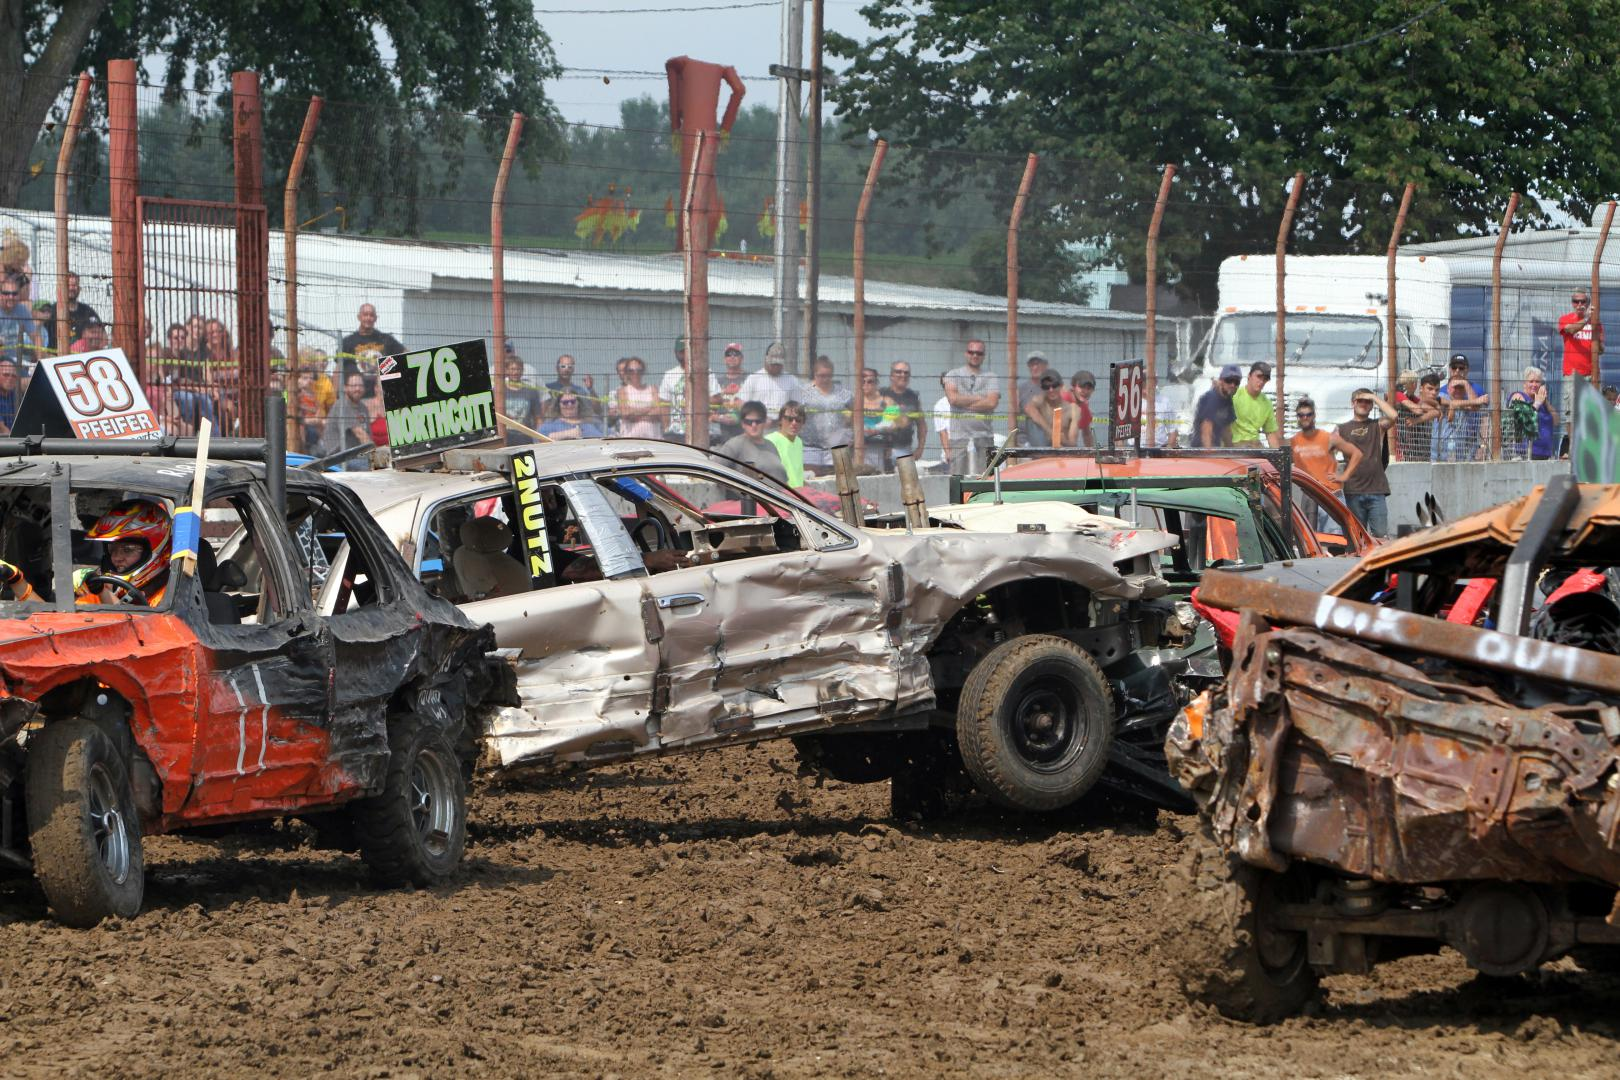 Wisconsin Demolition Derby at Dodge County Fair